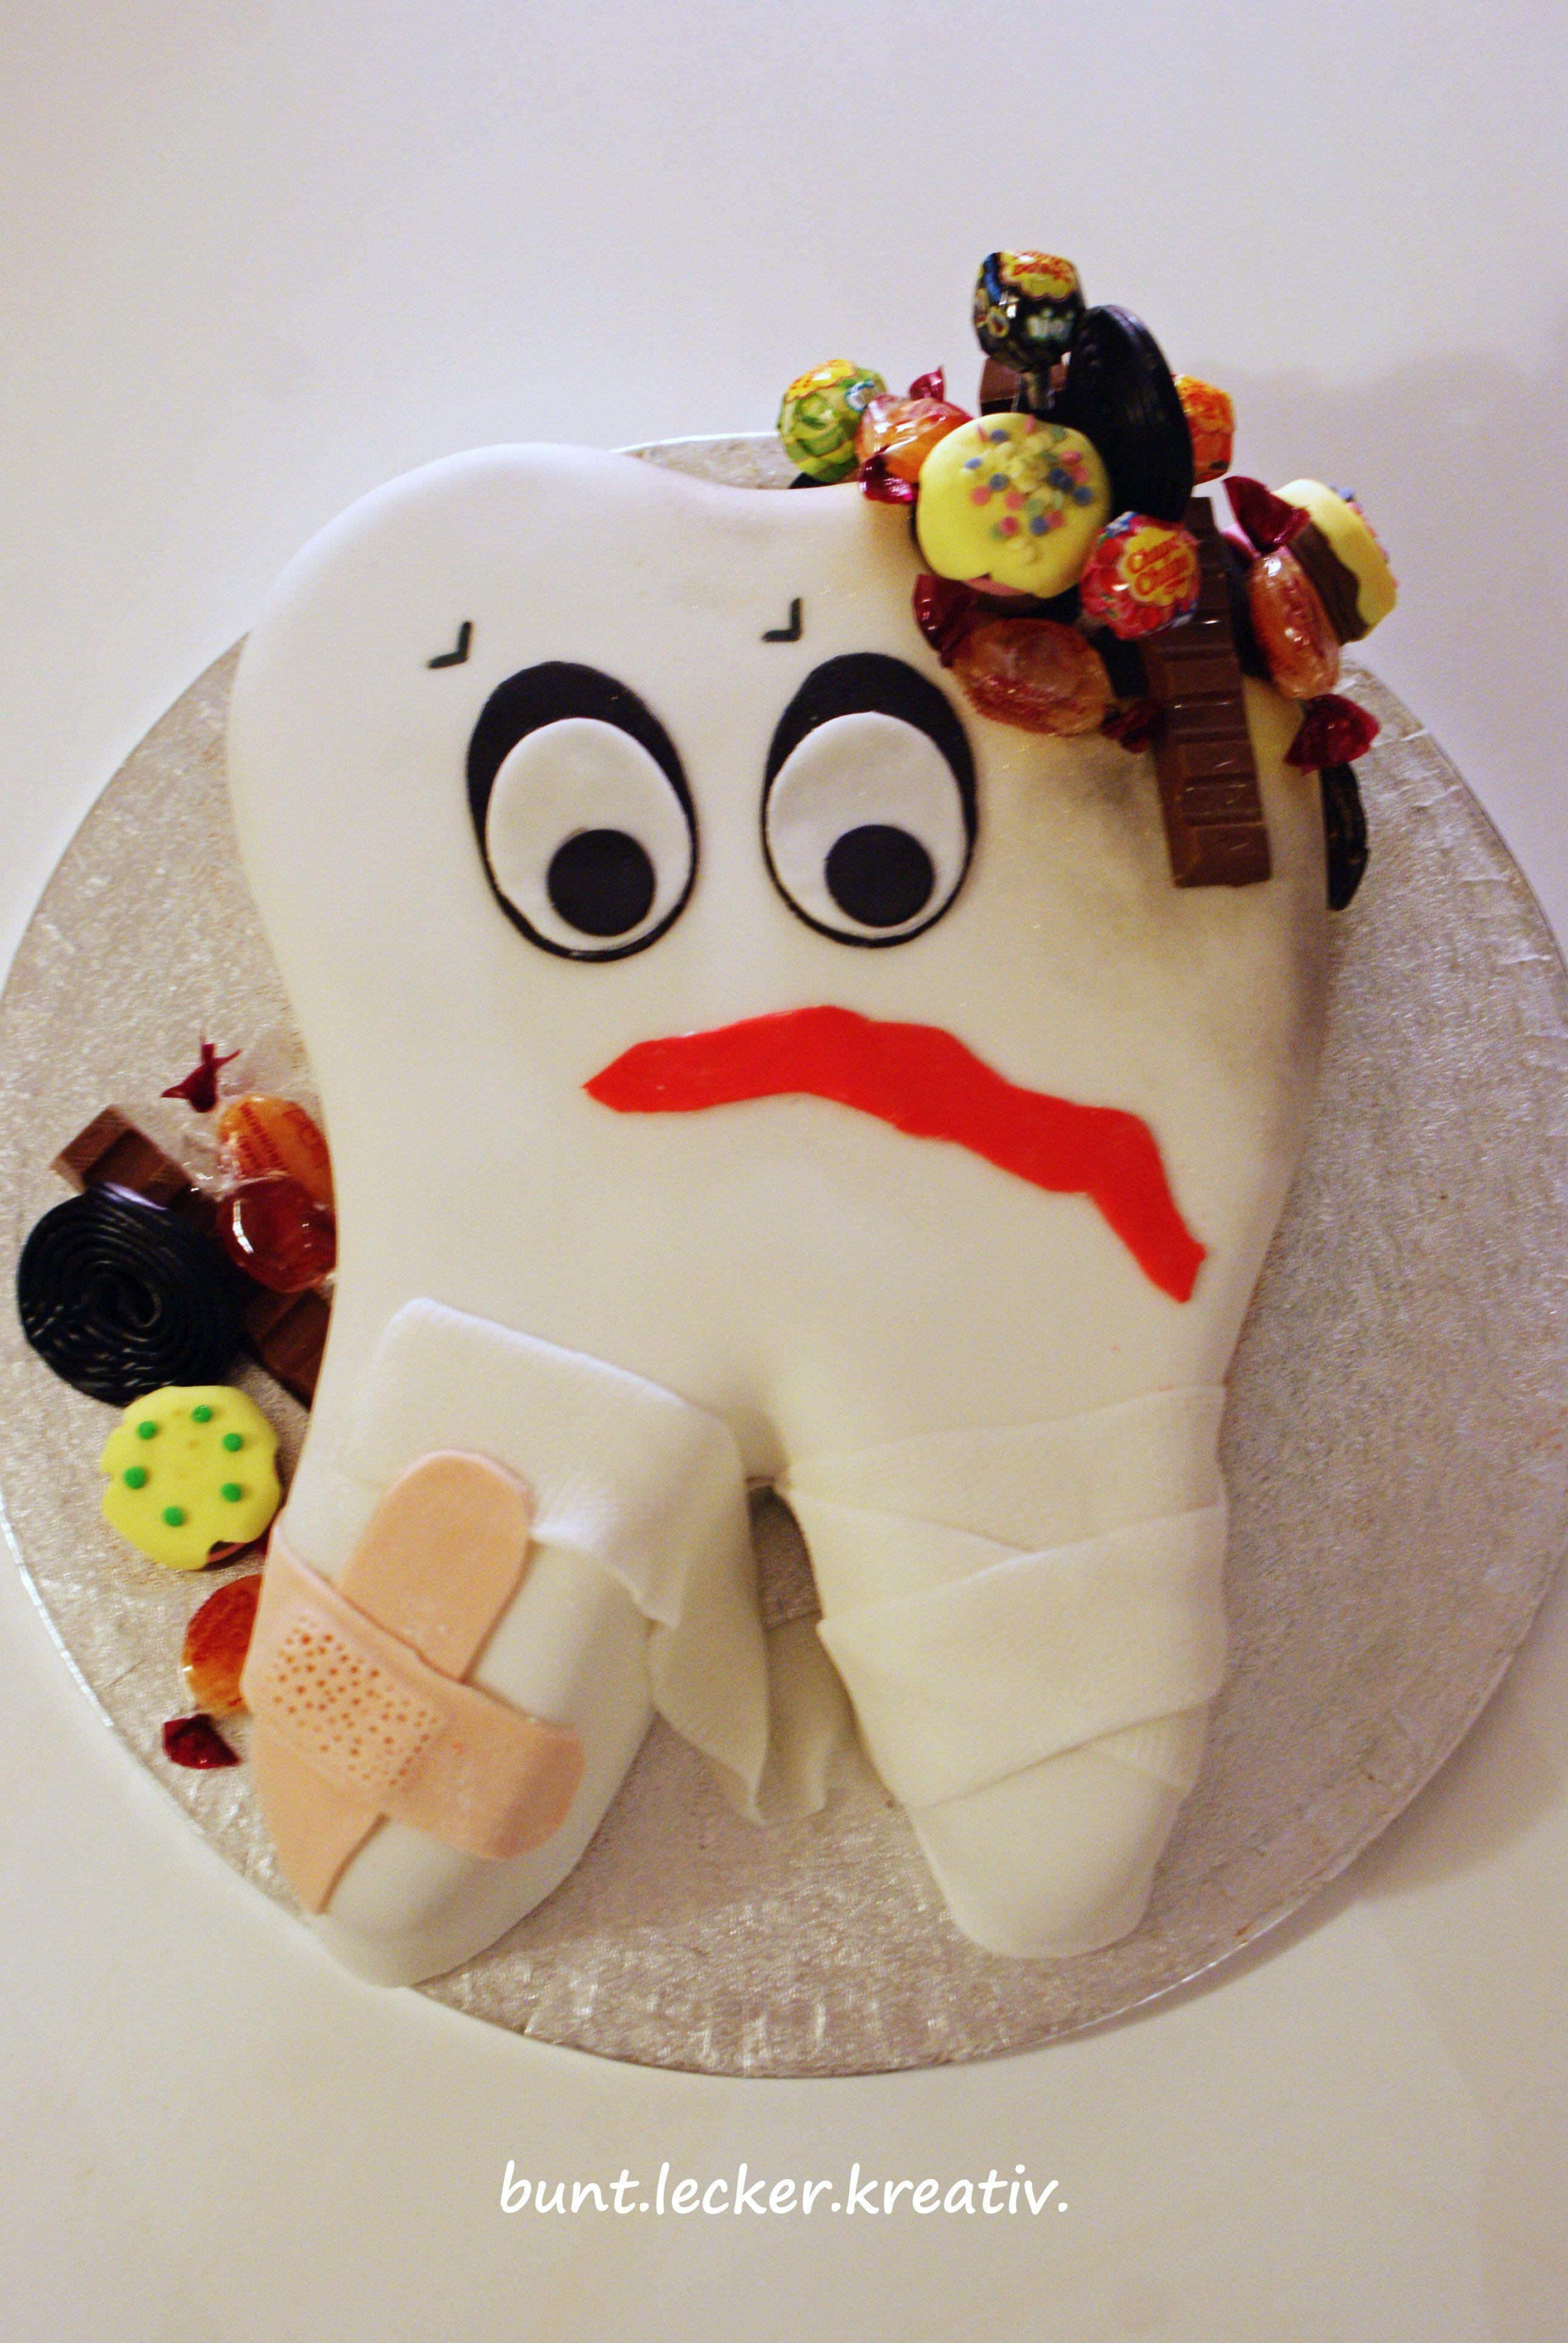 Torte Als Zahn Fur Einen Zahnarzt Cake Like A Tooth For A Dentist